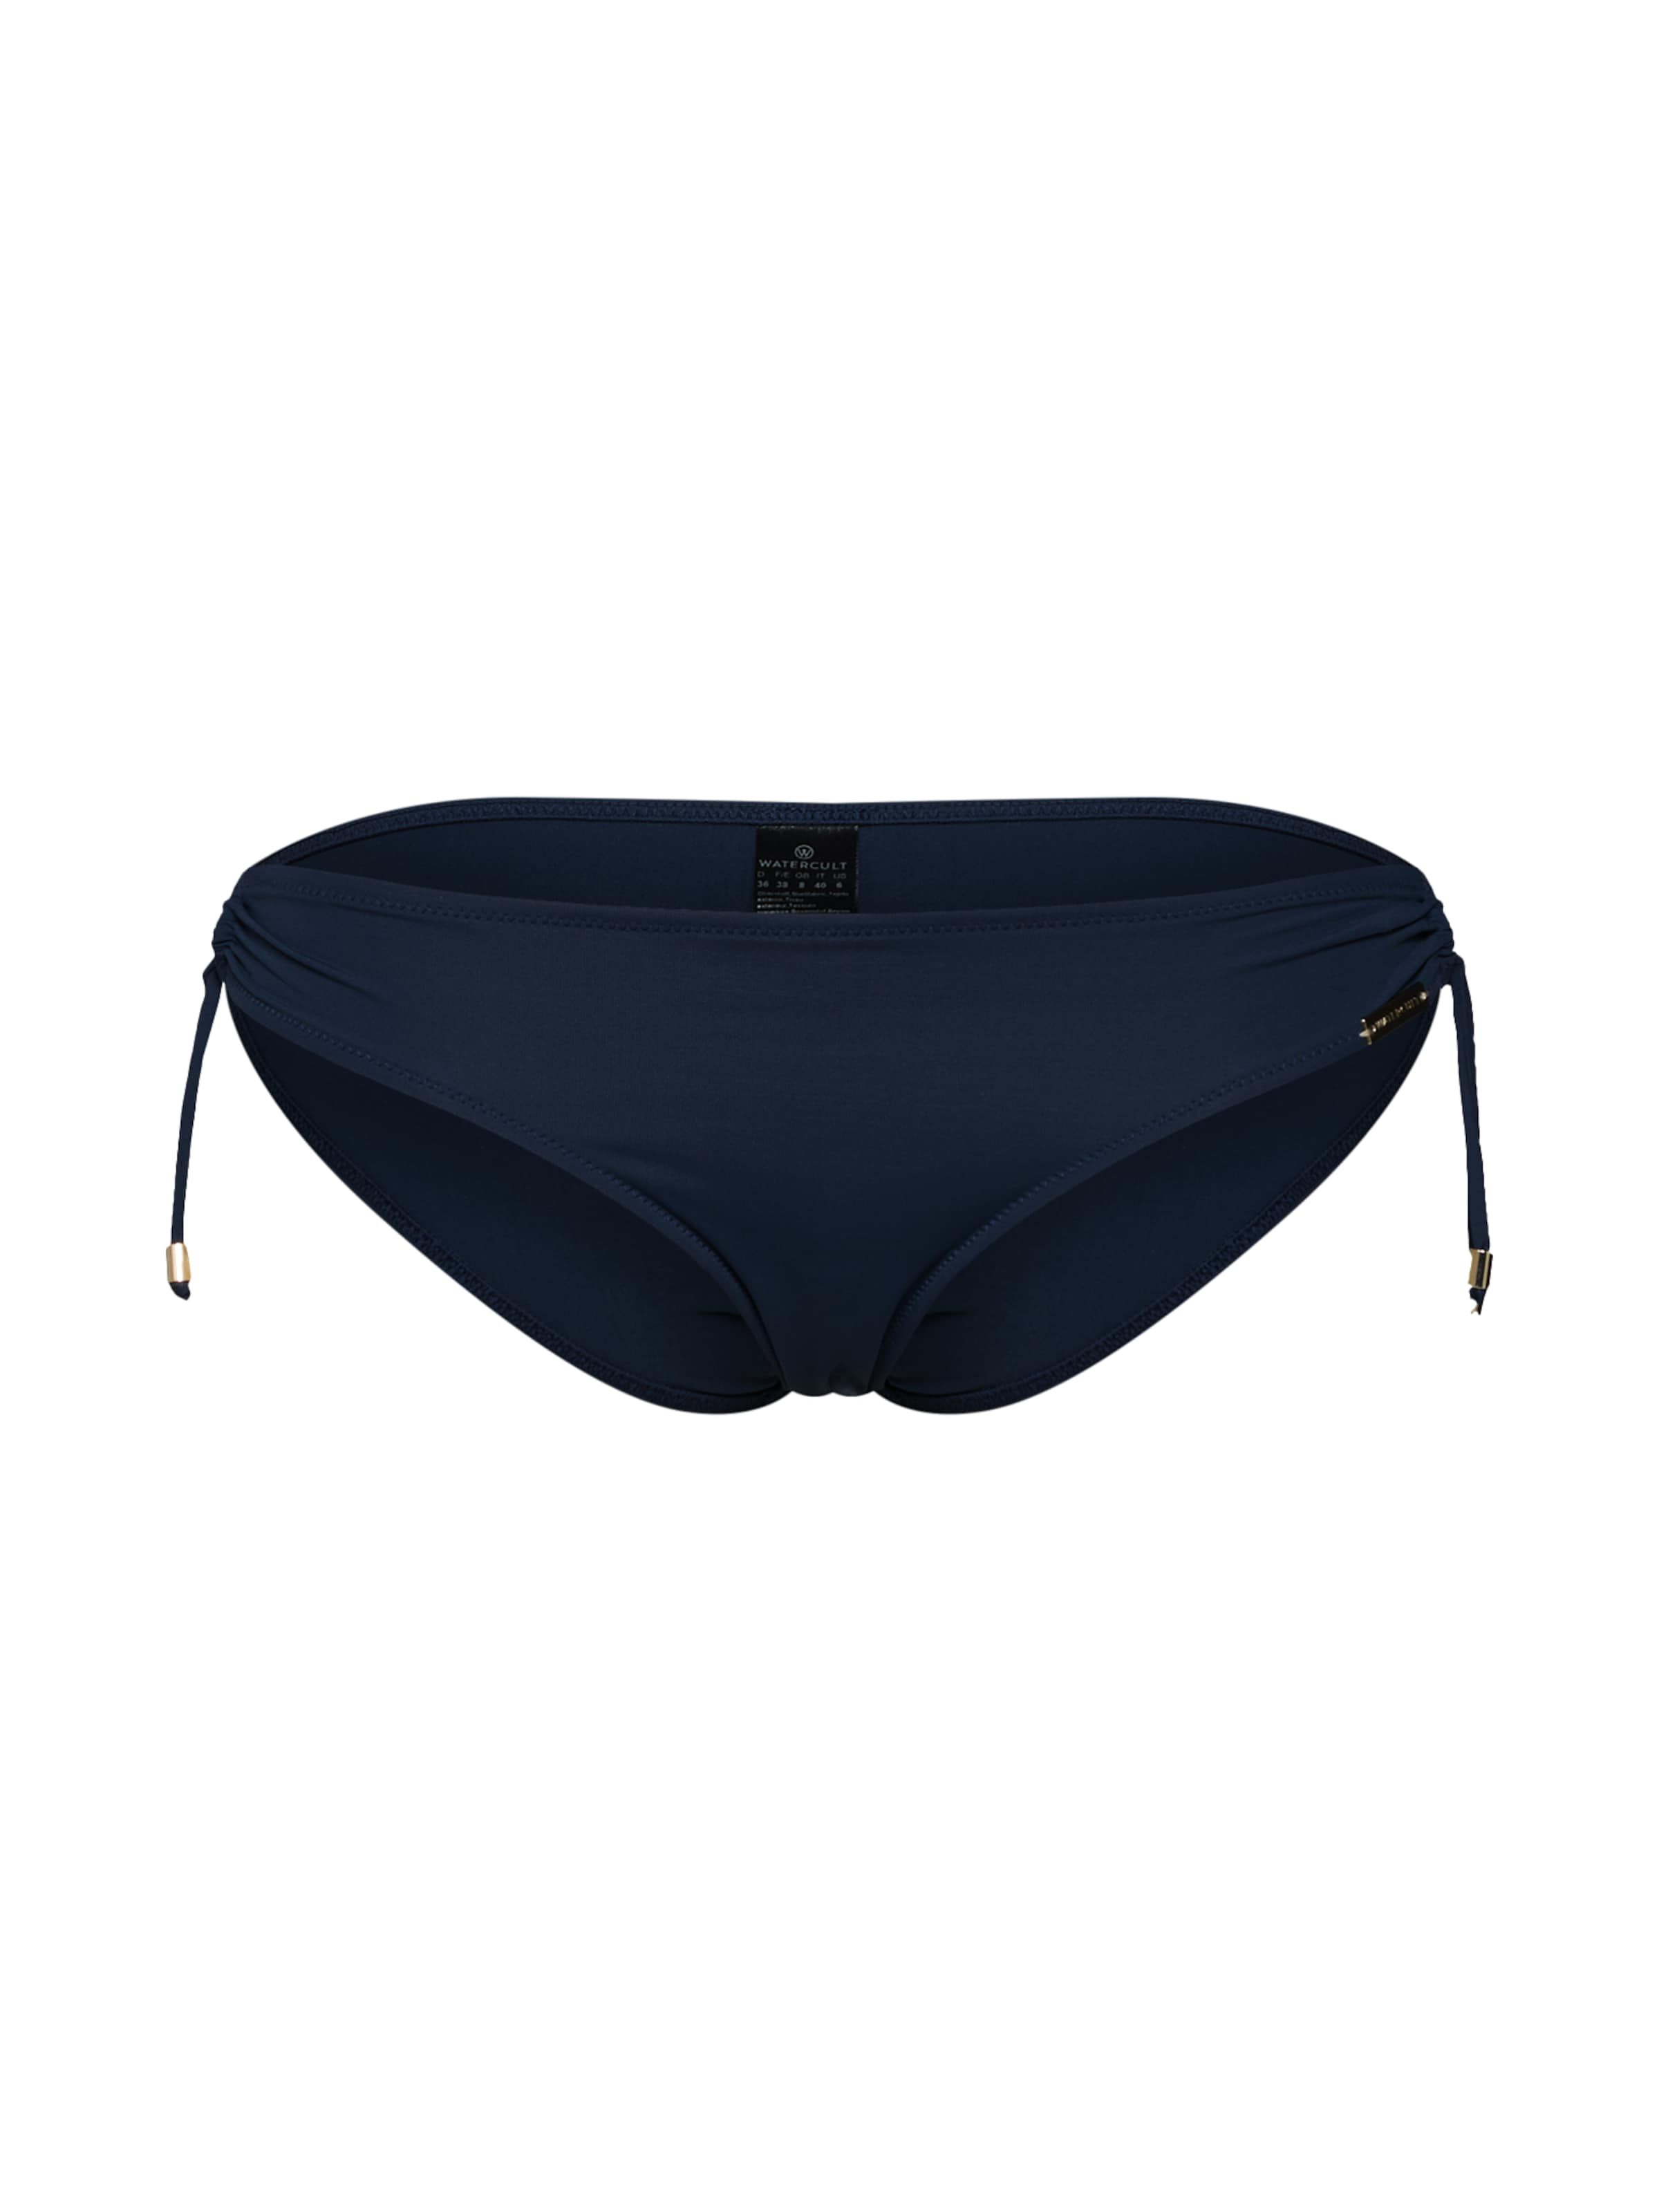 Bas Watercult En BleuMélange Couleurs Bikini Merlot De T1l3FuJcK